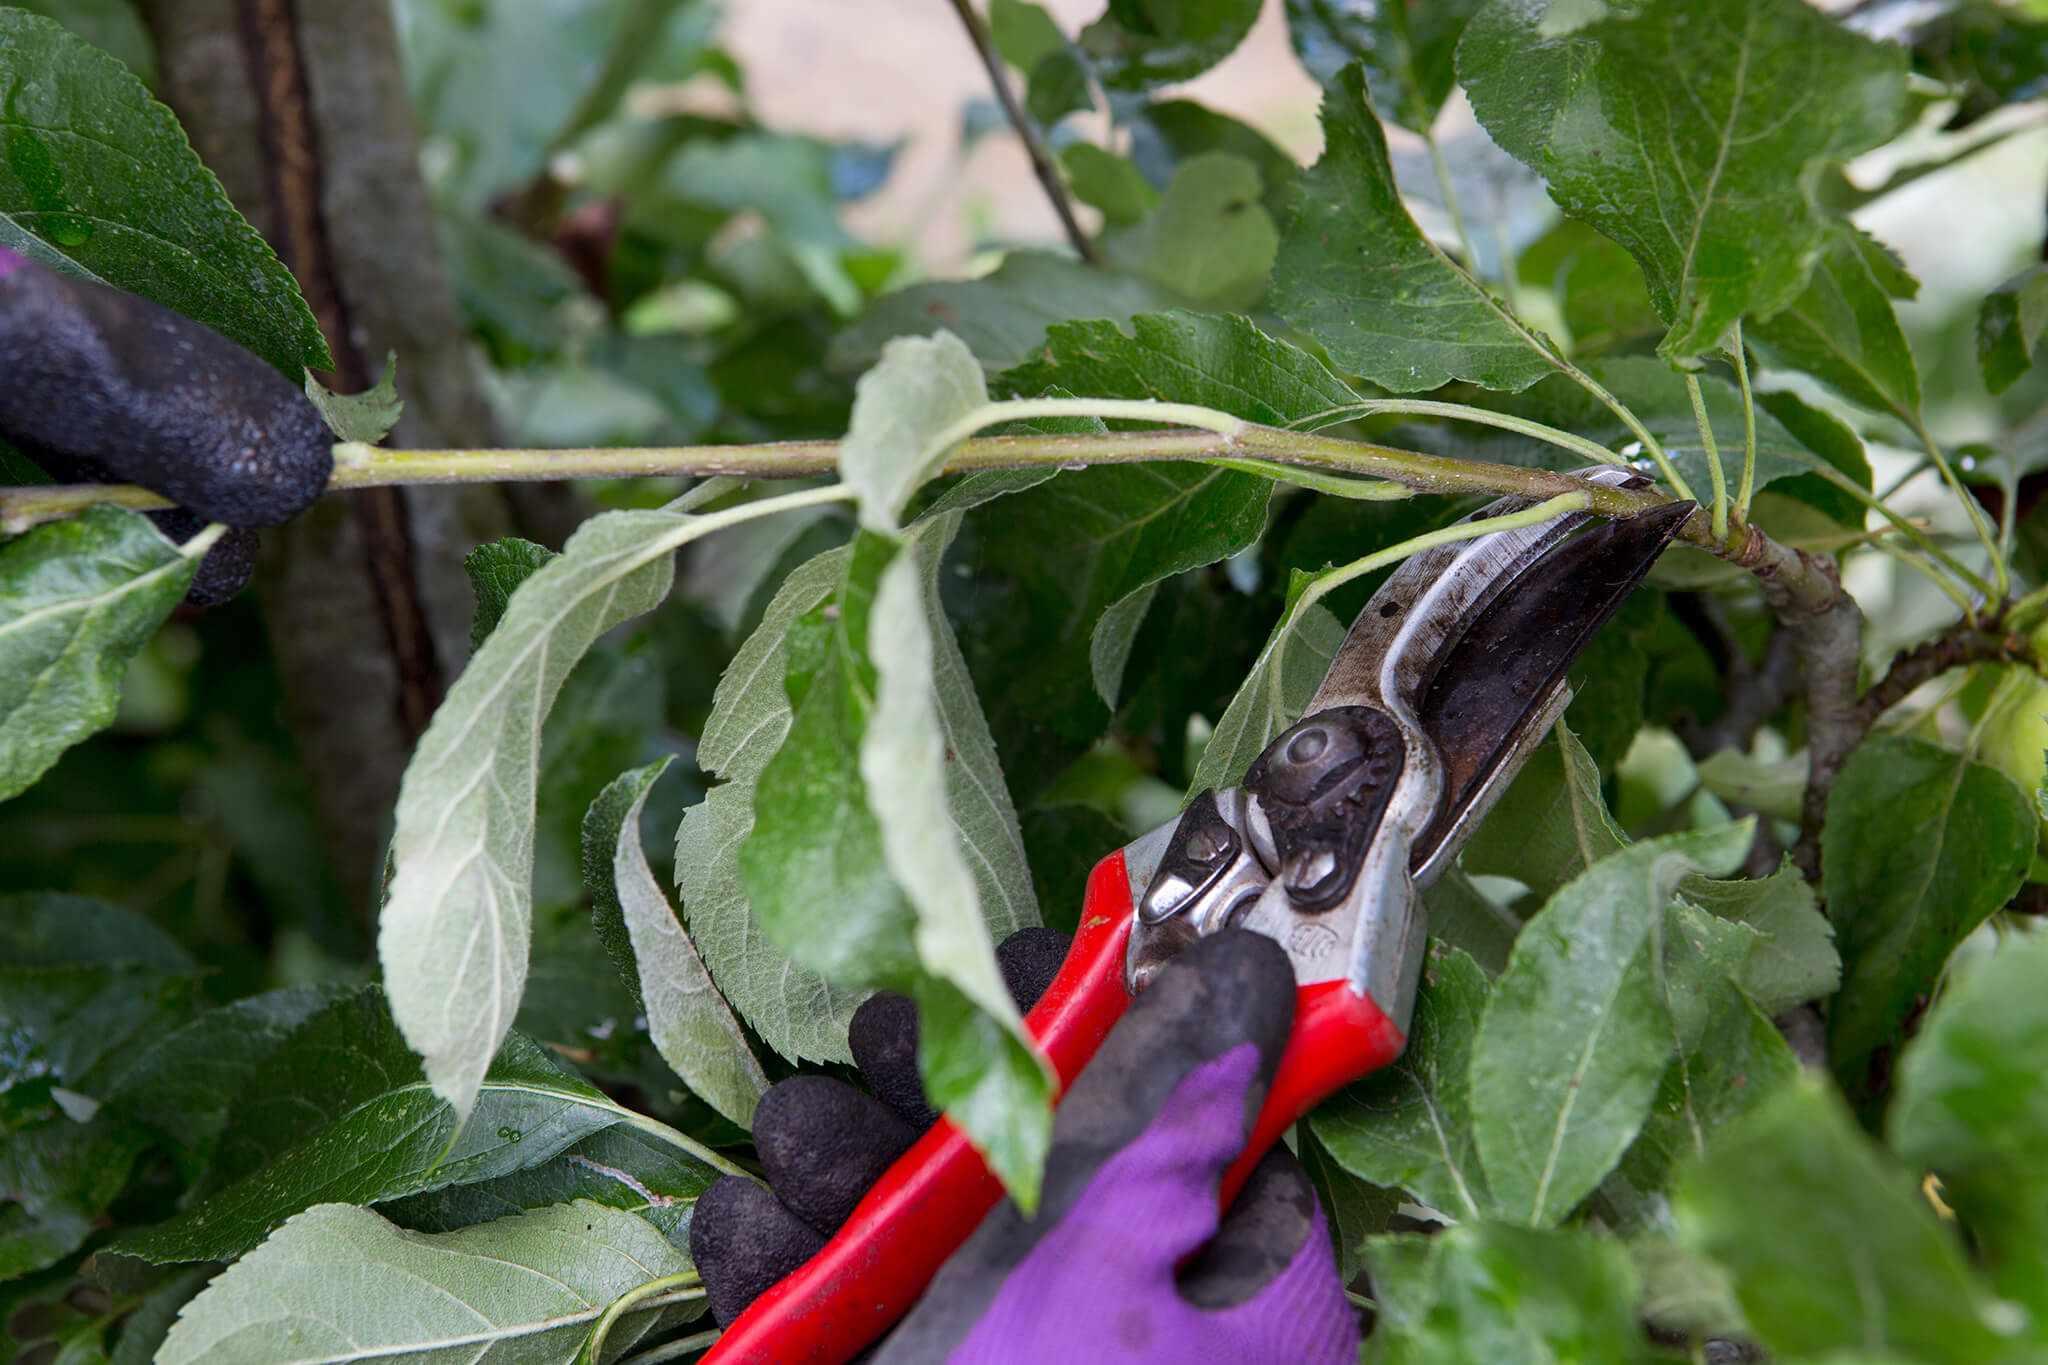 Cutting back apple tree sideshoots